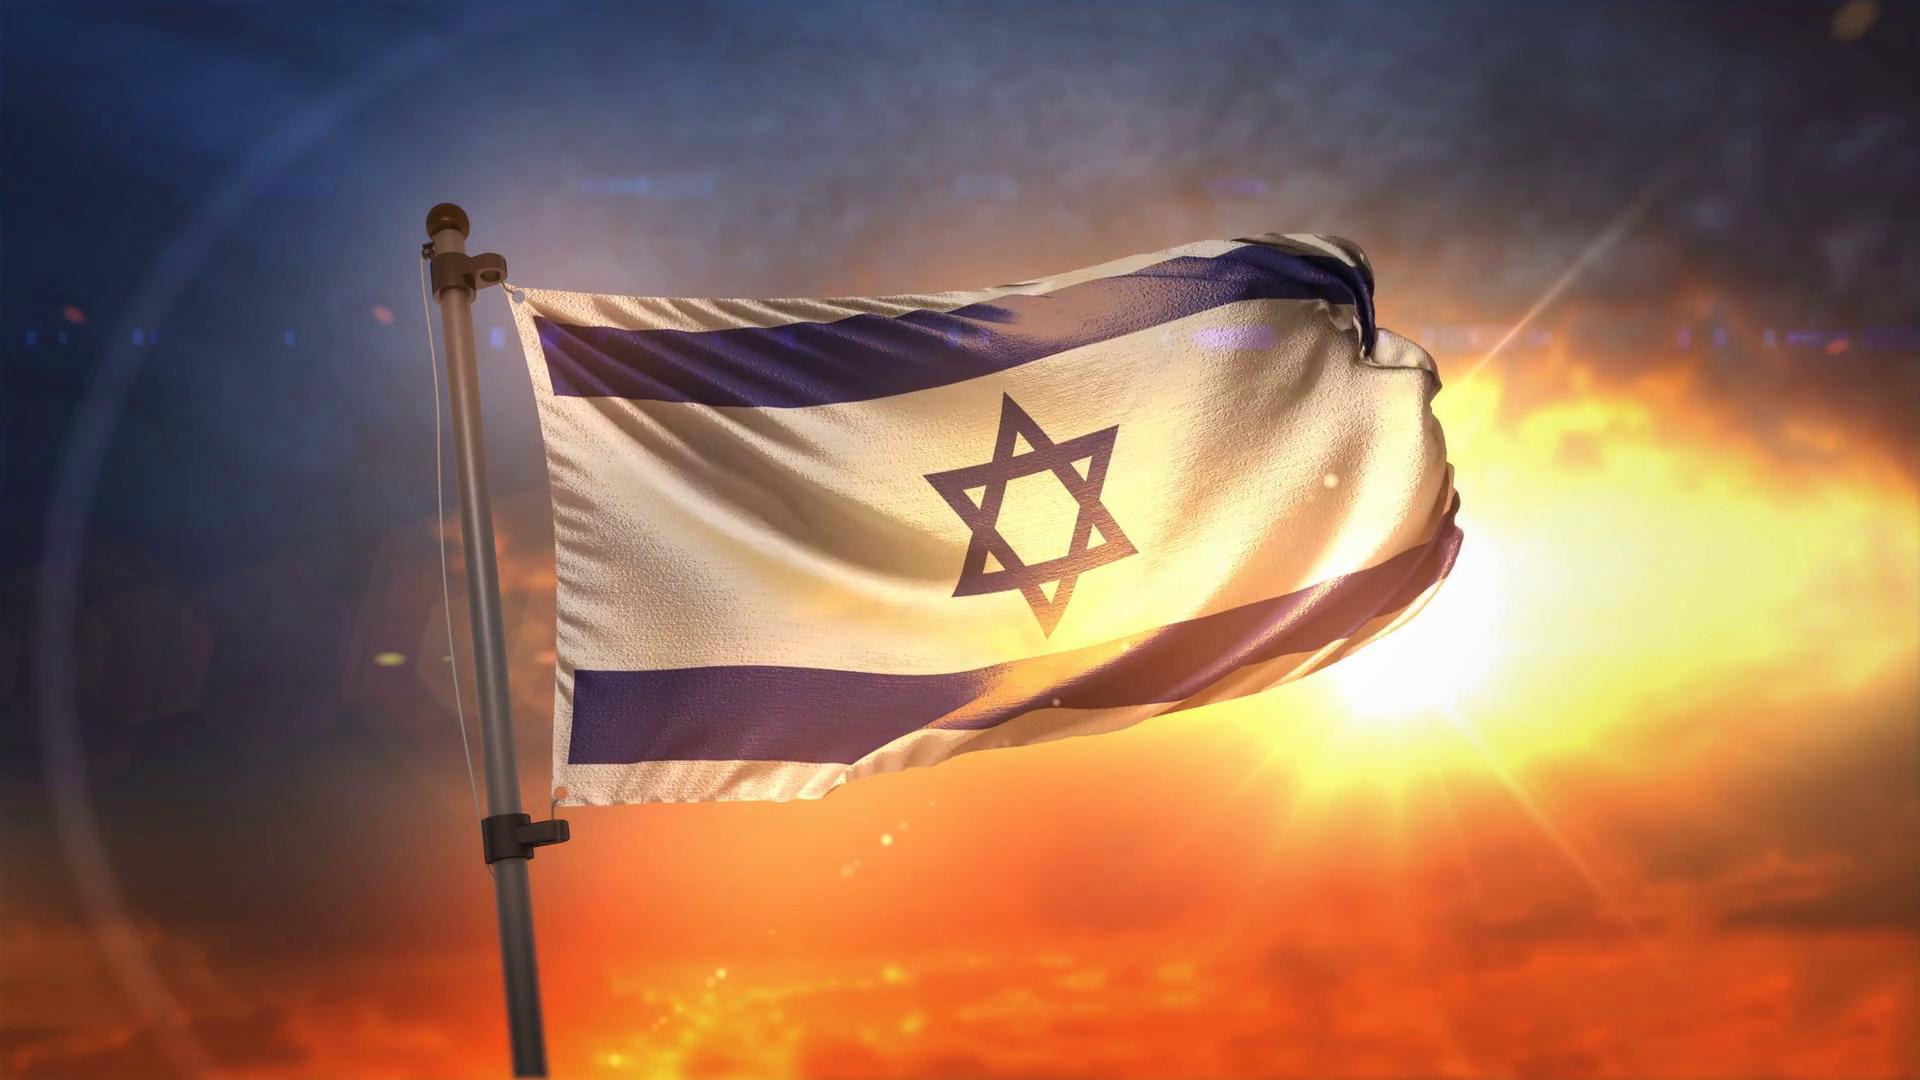 videoblocks-israel-flag-backlit-at-beautiful-sunrise-loop-slow-motion-4k_rxvoffswz_thumbnail-full06.png